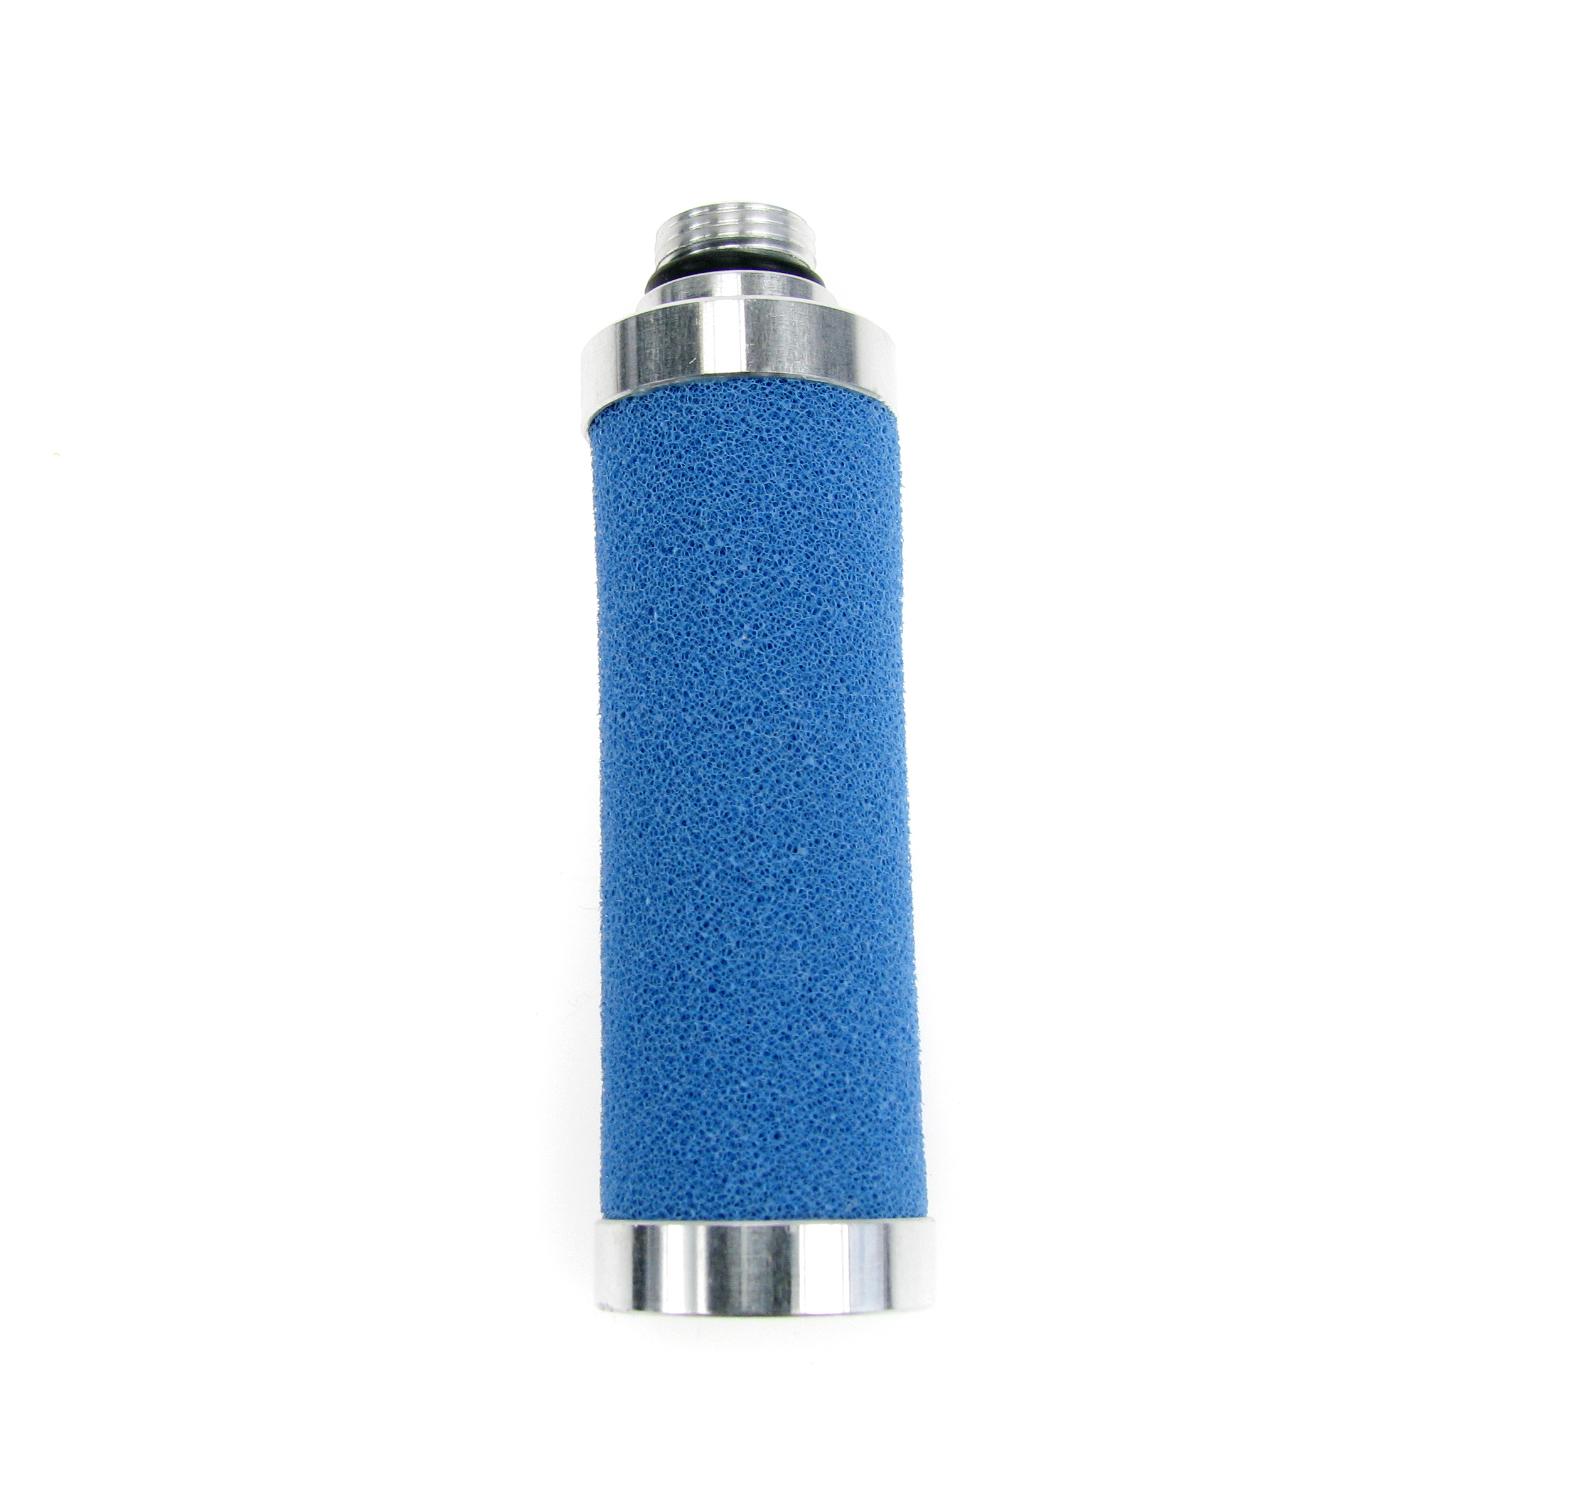 Filterinzetstuk blauw (microfilter) 0,01µ